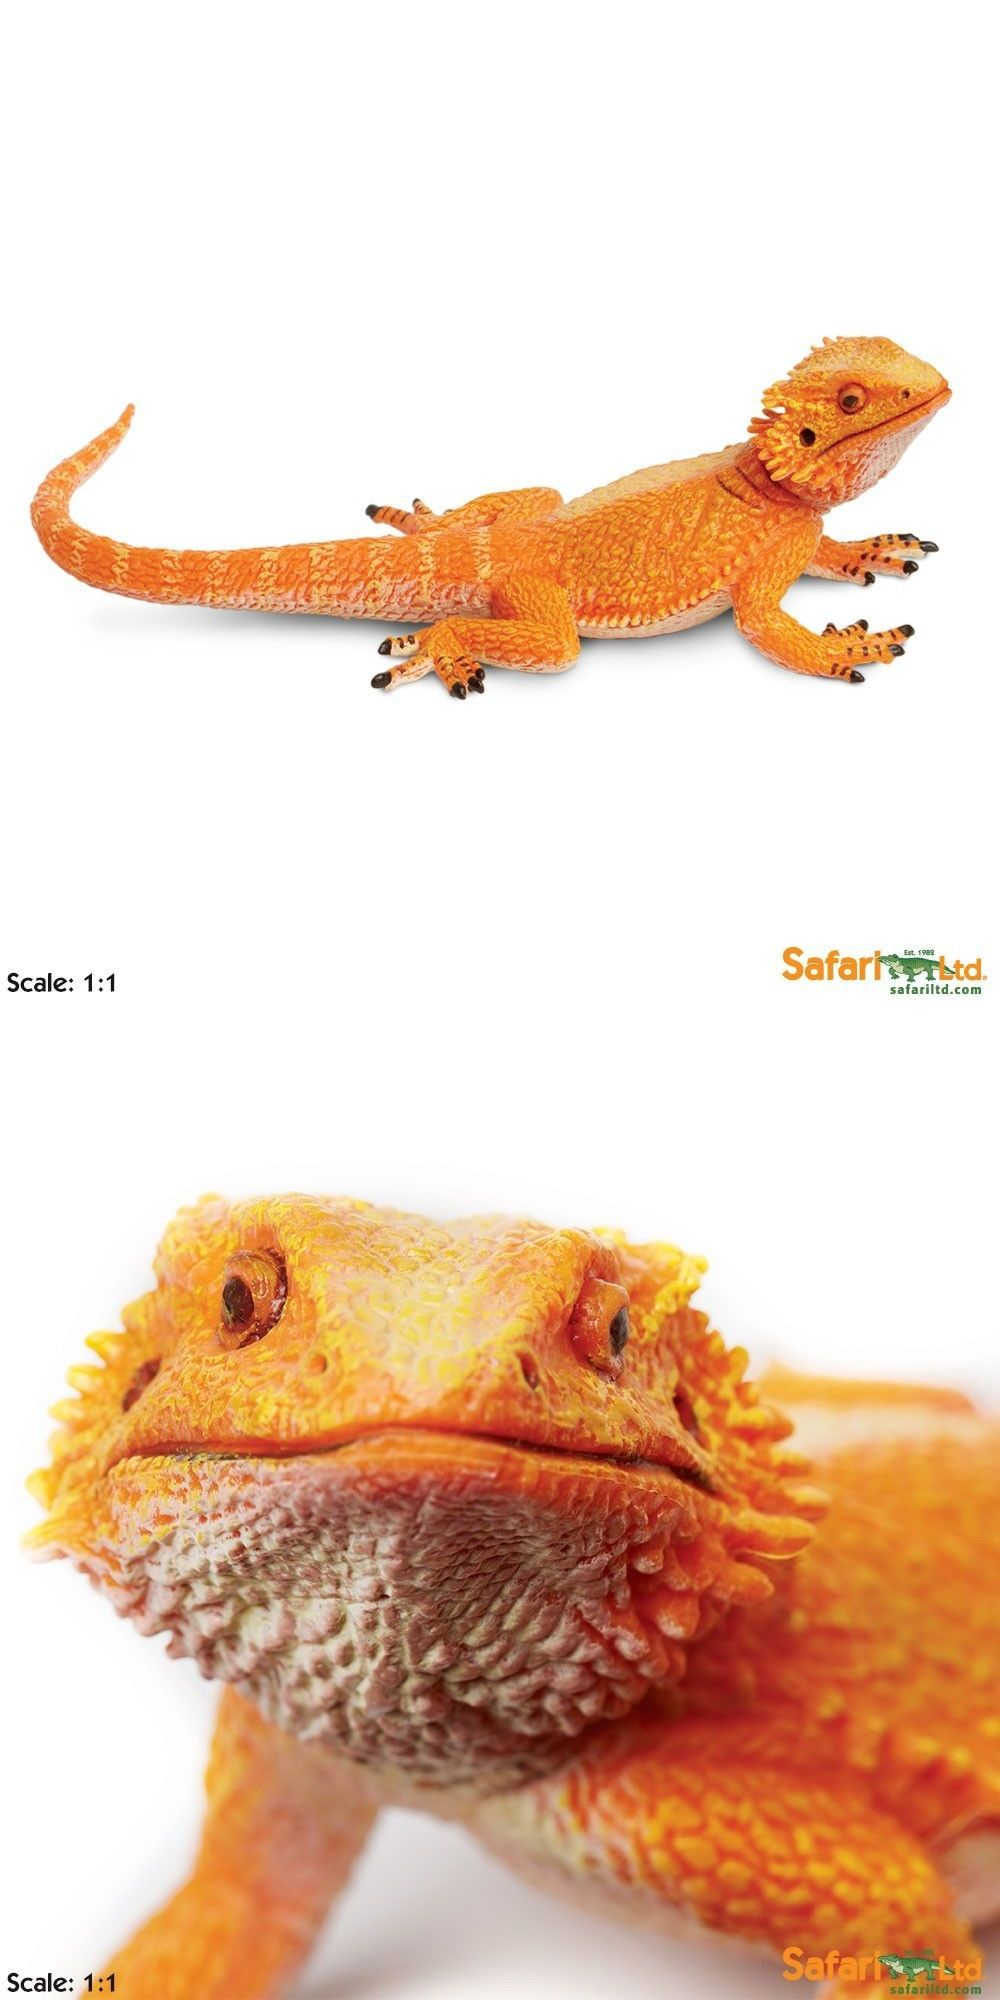 50cc8023597 Educational 11731: Bearded Dragon Incredible Creatures Figure Safari ...